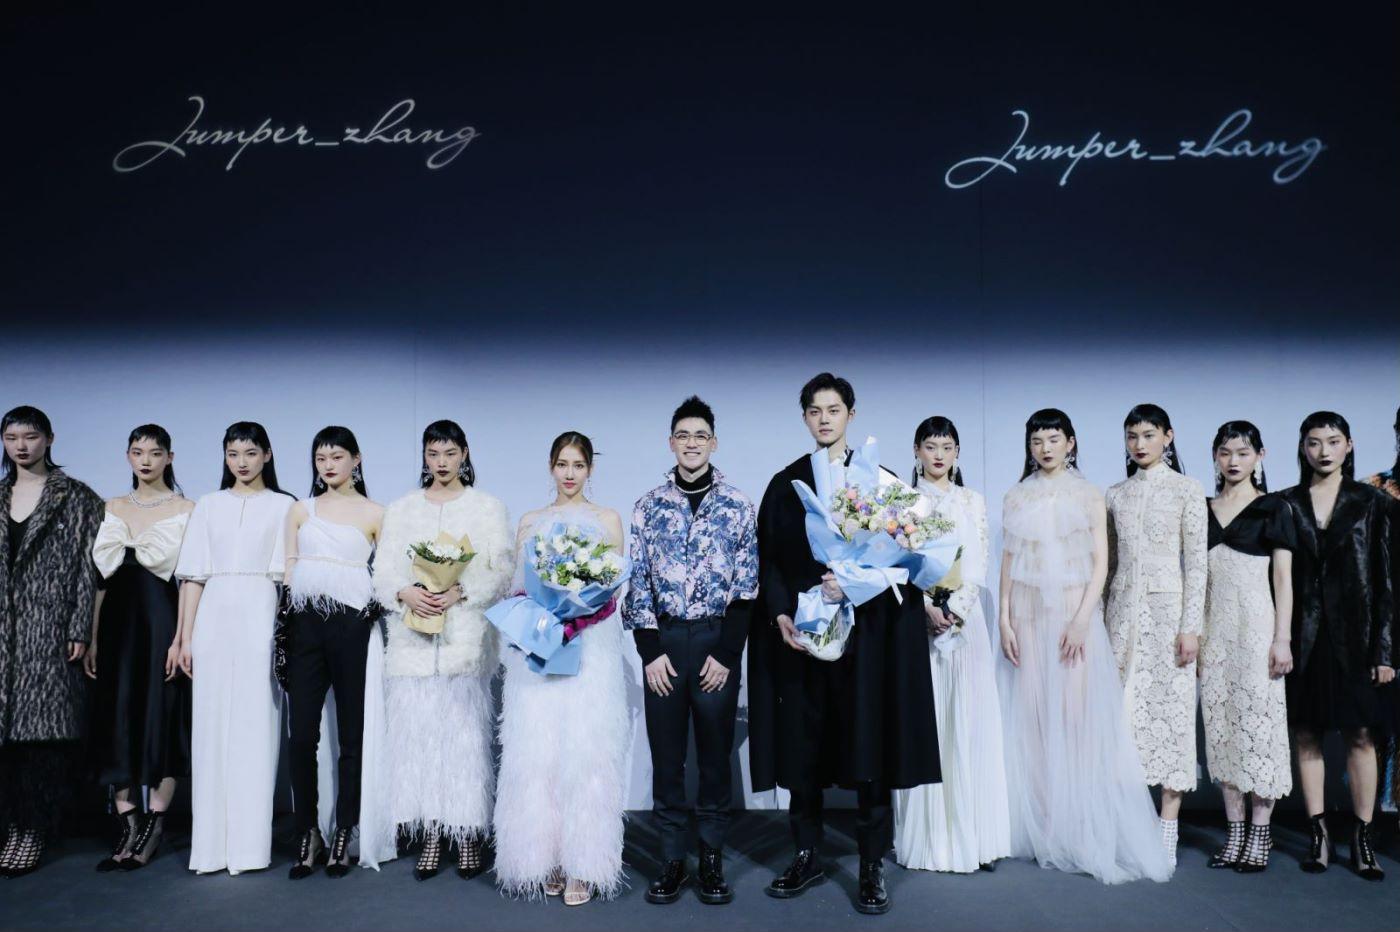 黄�叉�JUMPER ZHANG主题大秀QUEEN'S LOVE发布敢达创战者13